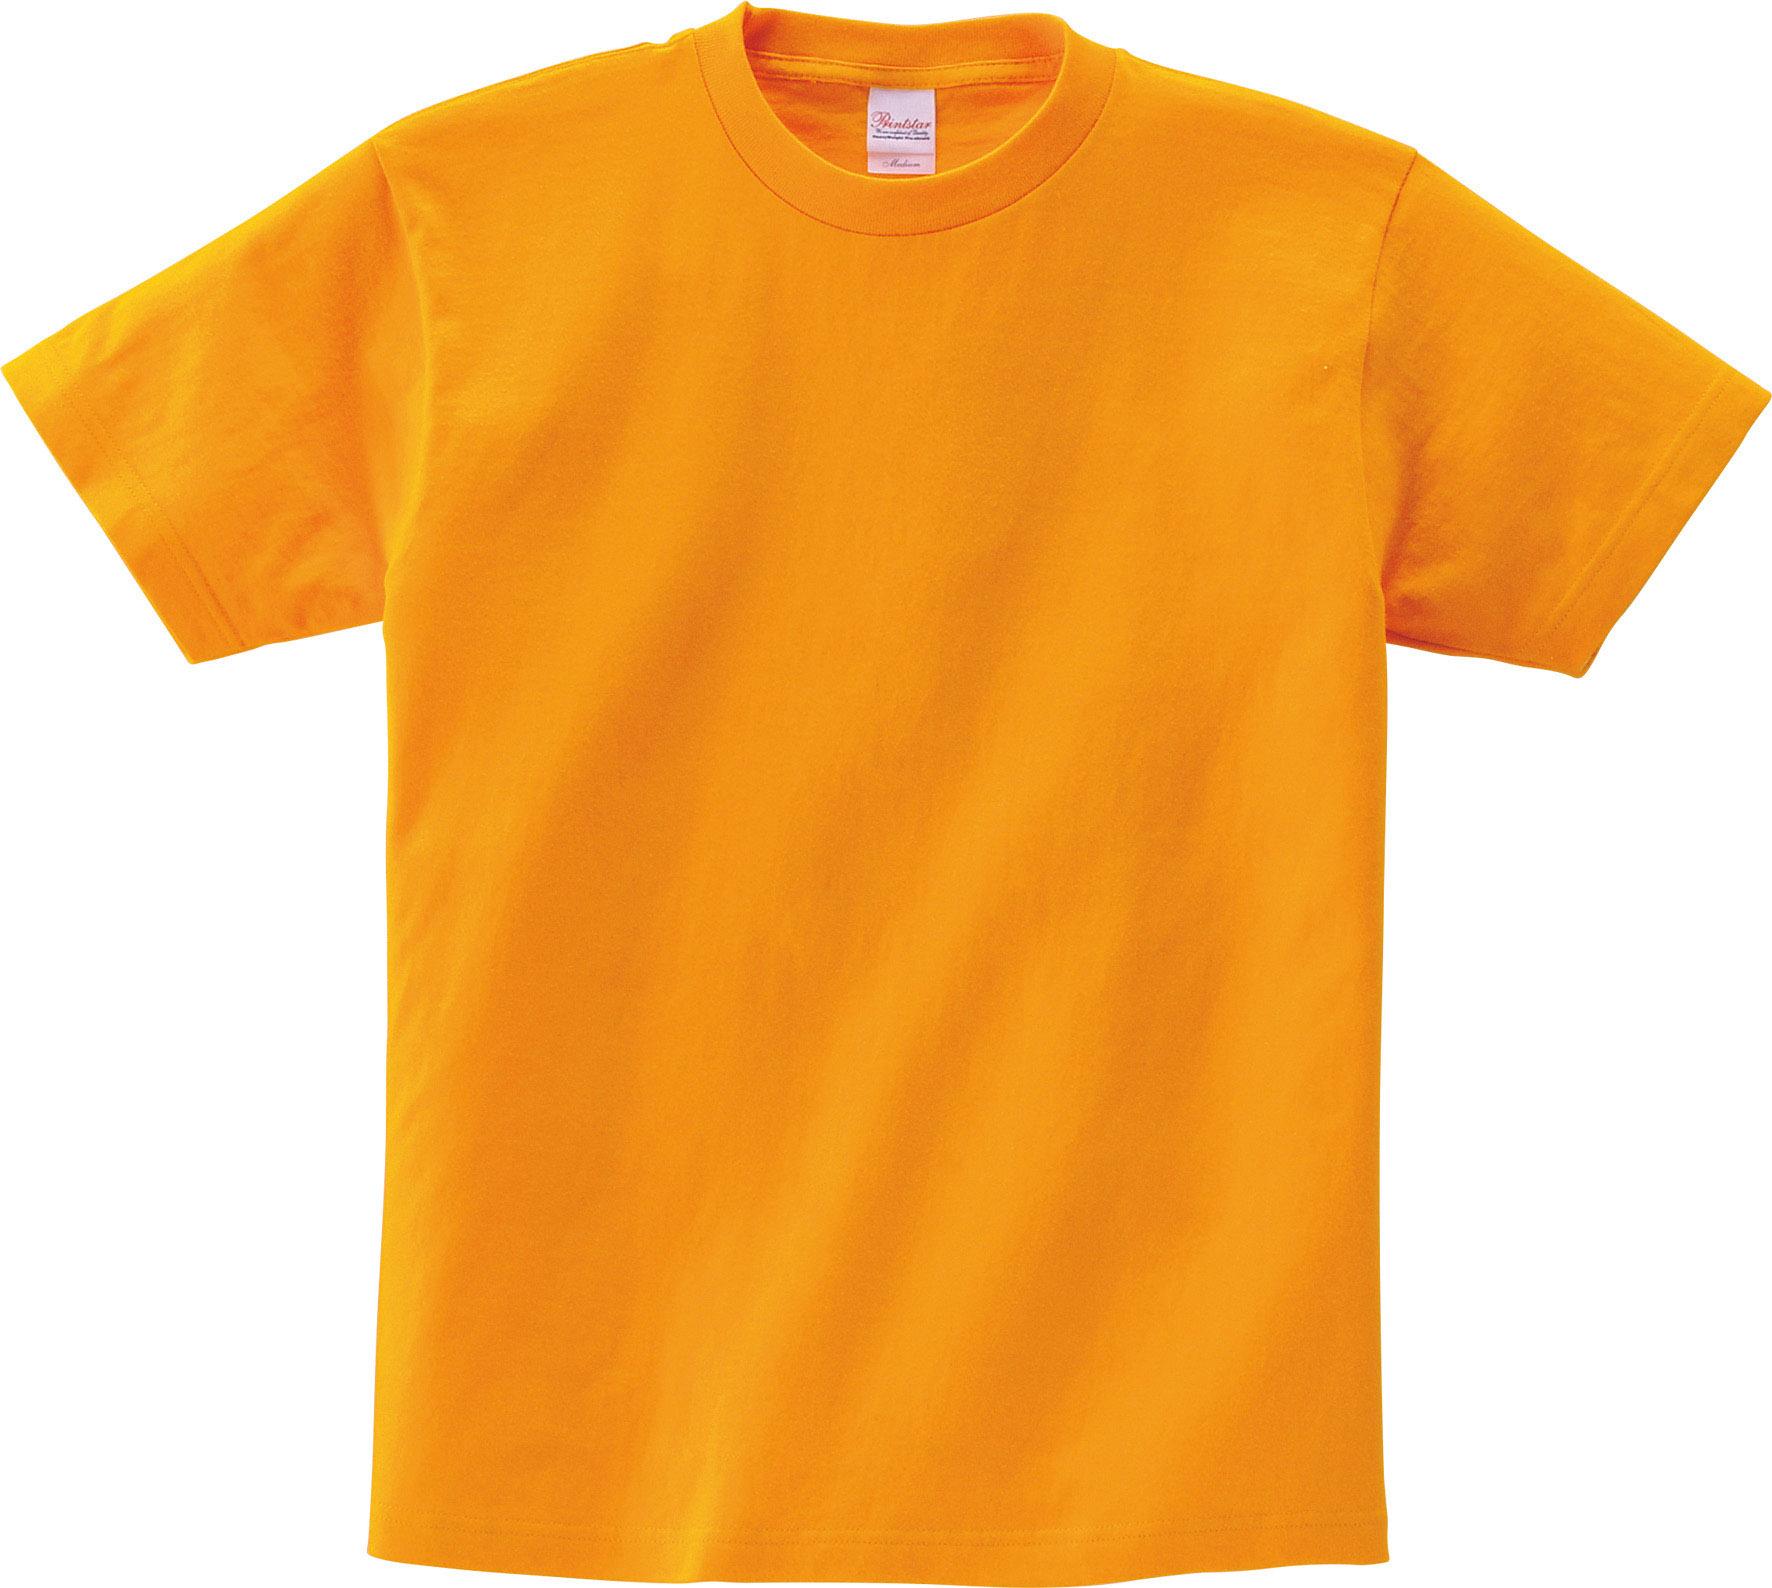 00085-CVT 5.6オンス・ヘビーウェイトTシャツ - 077-ゴールドイエロー, 130